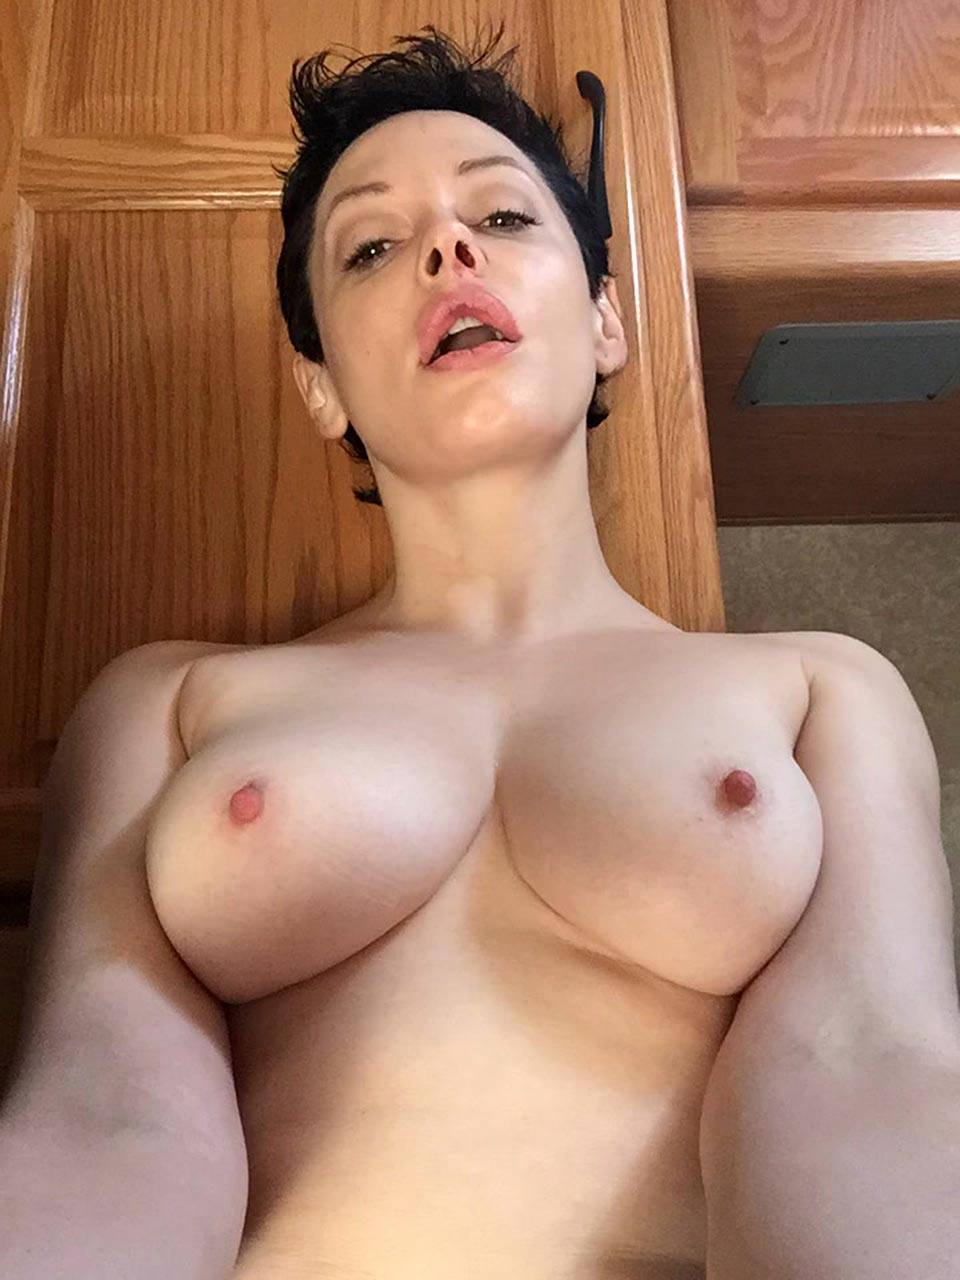 Nakedpics